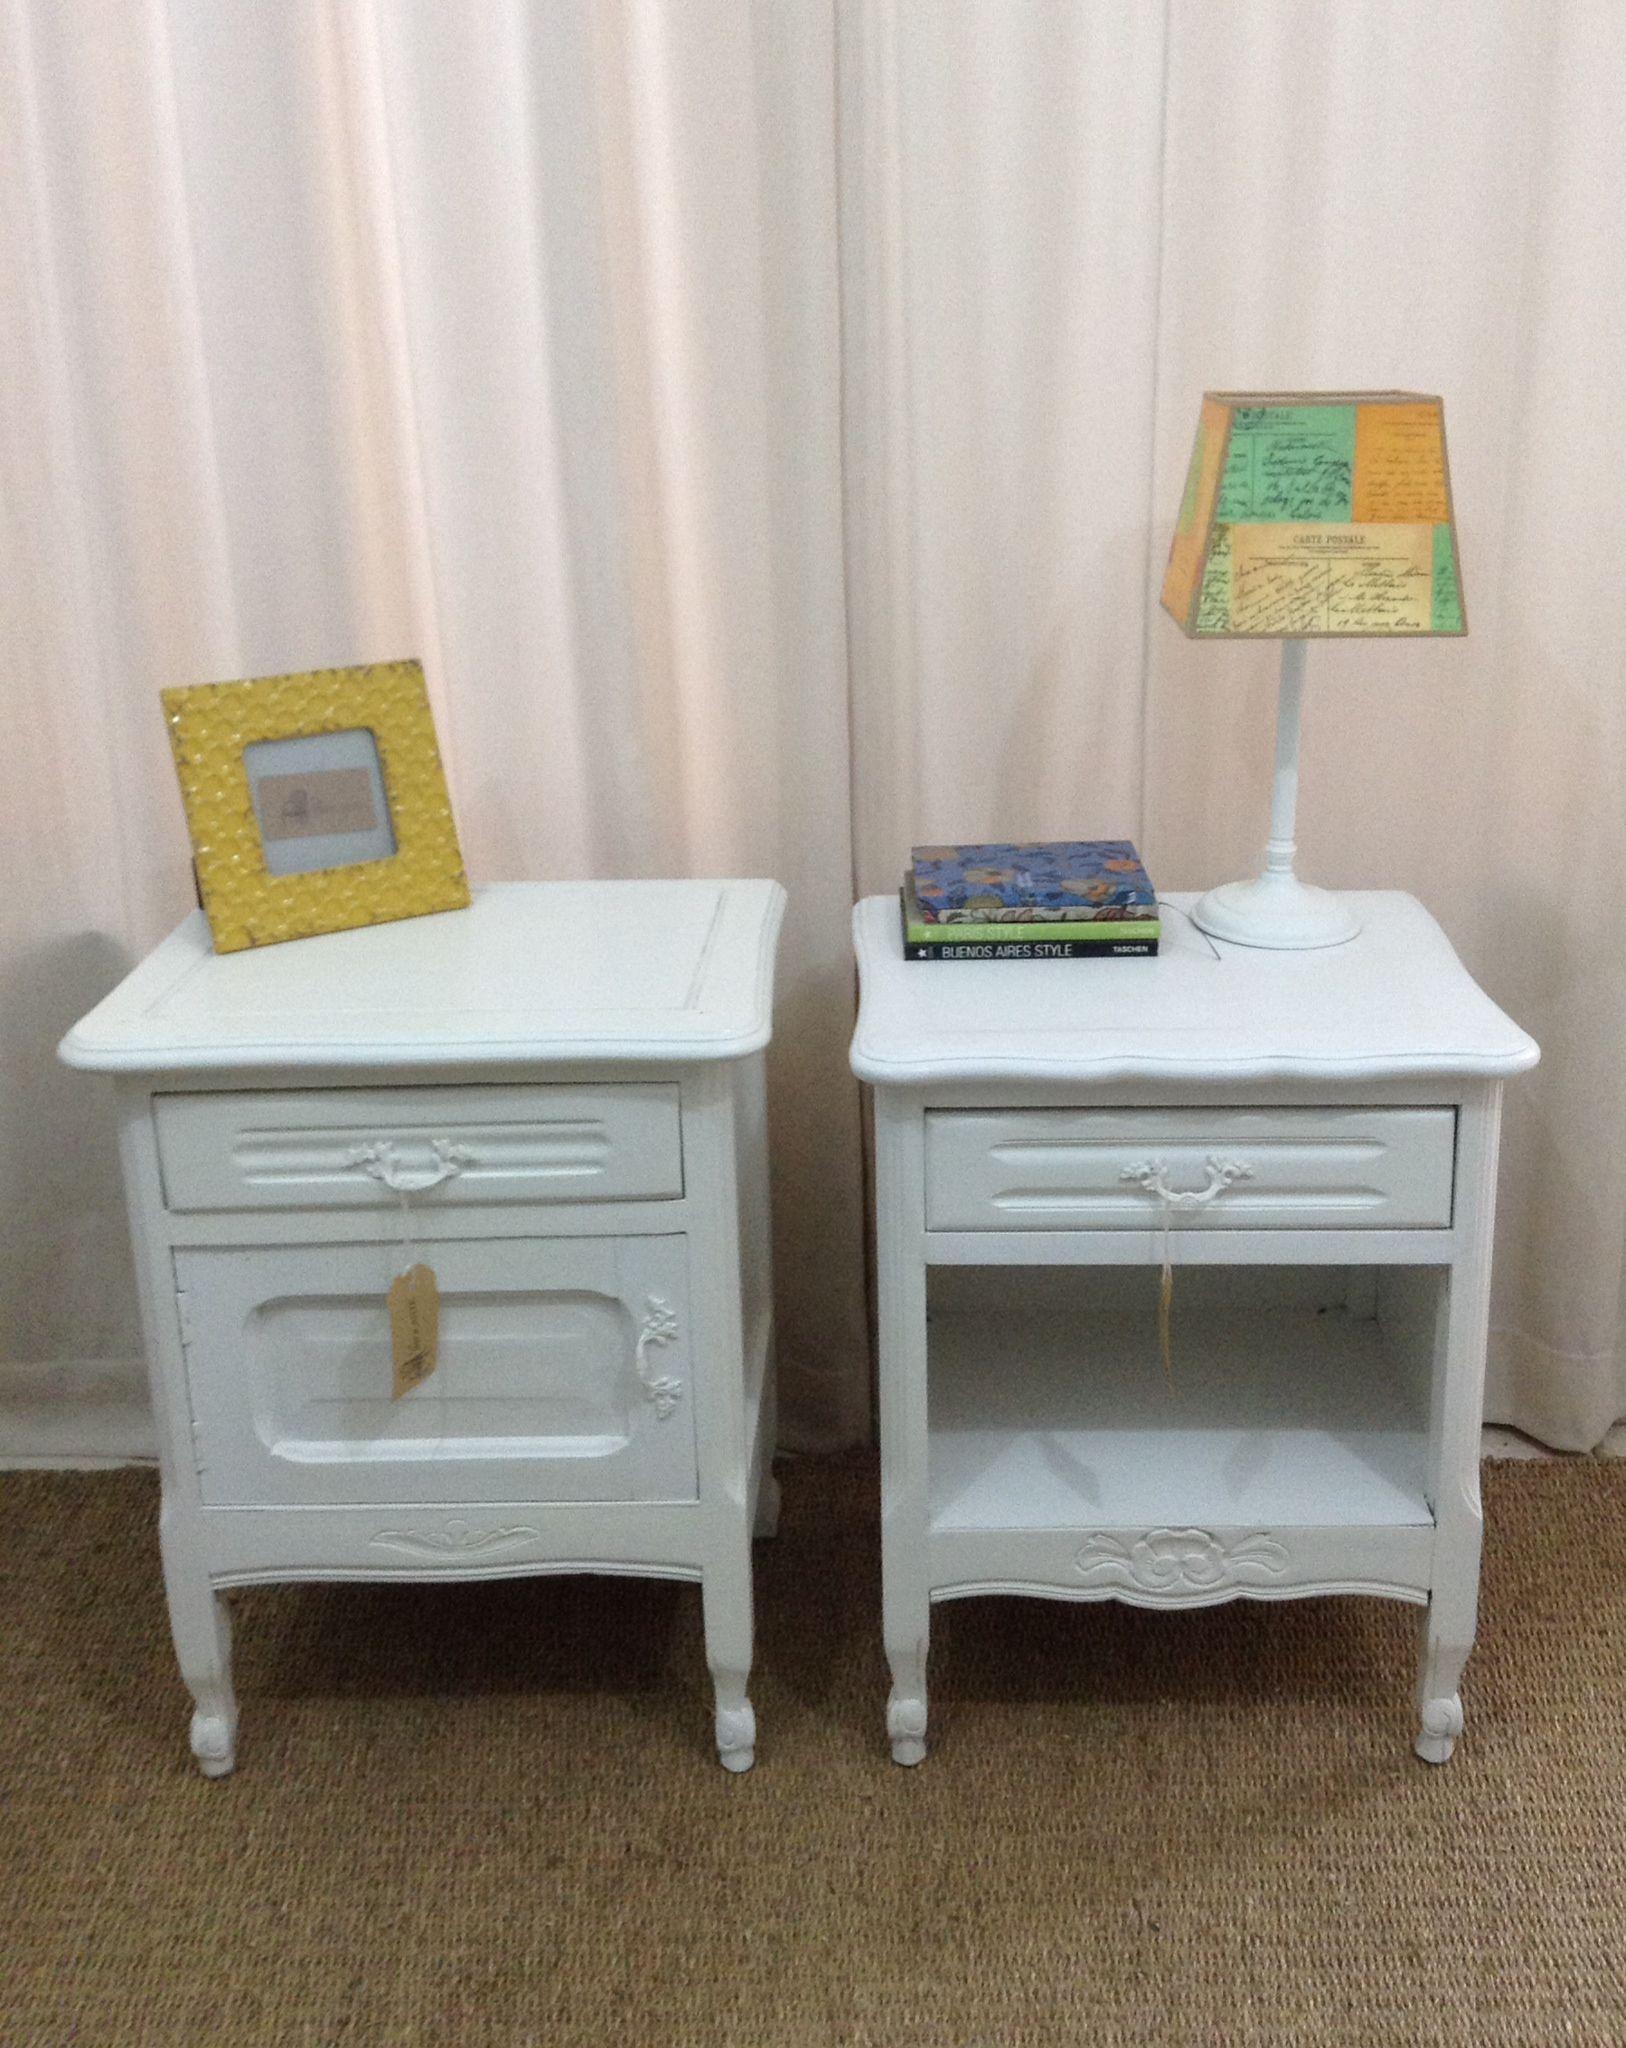 Mesas de luz antiguas restauradas muebles restaurados - Muebles restaurados vintage ...